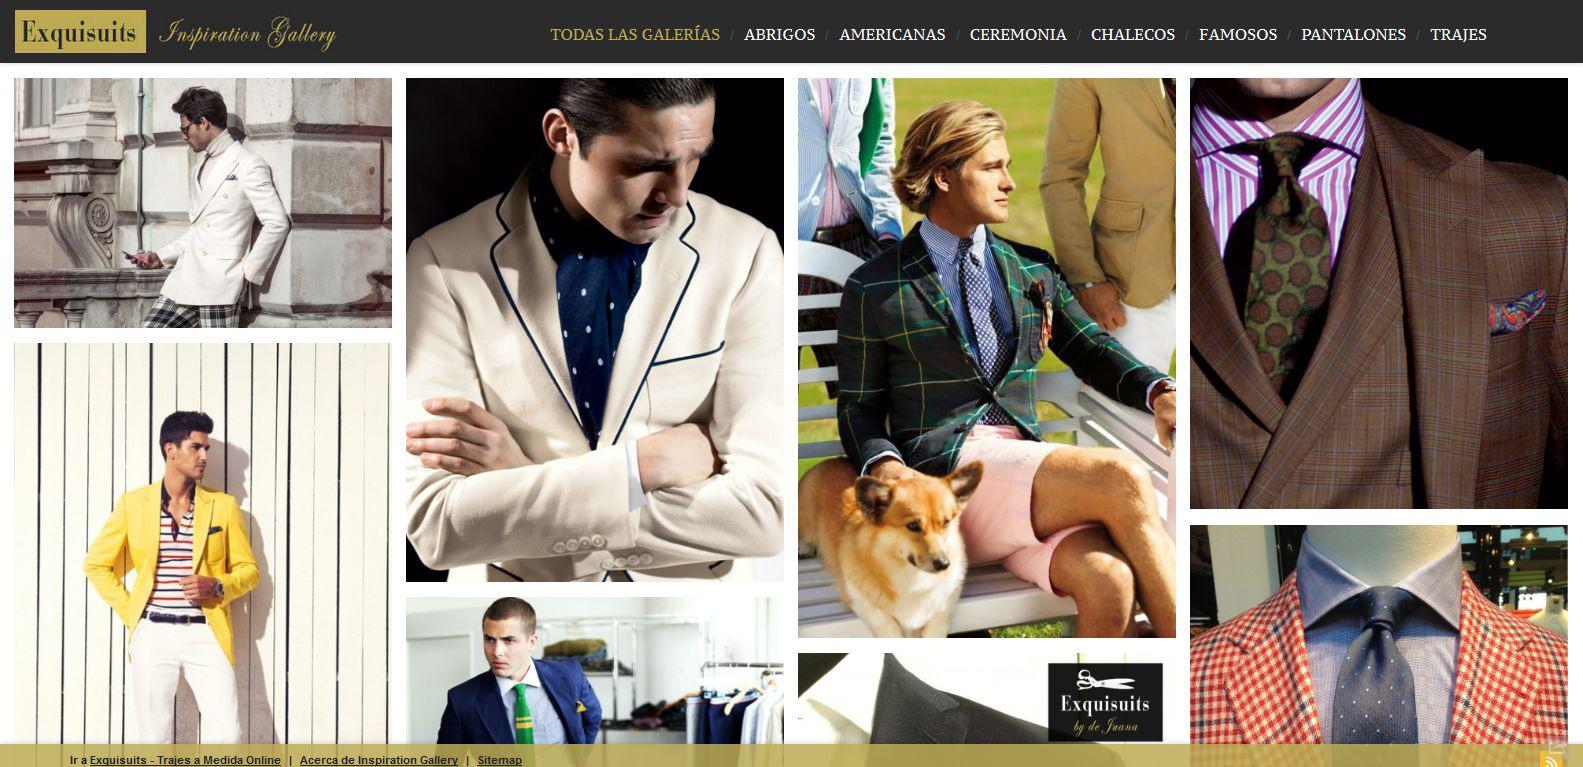 Galerías de Inspiración de Trajes, Americanas, tendencias moda masculina 2013